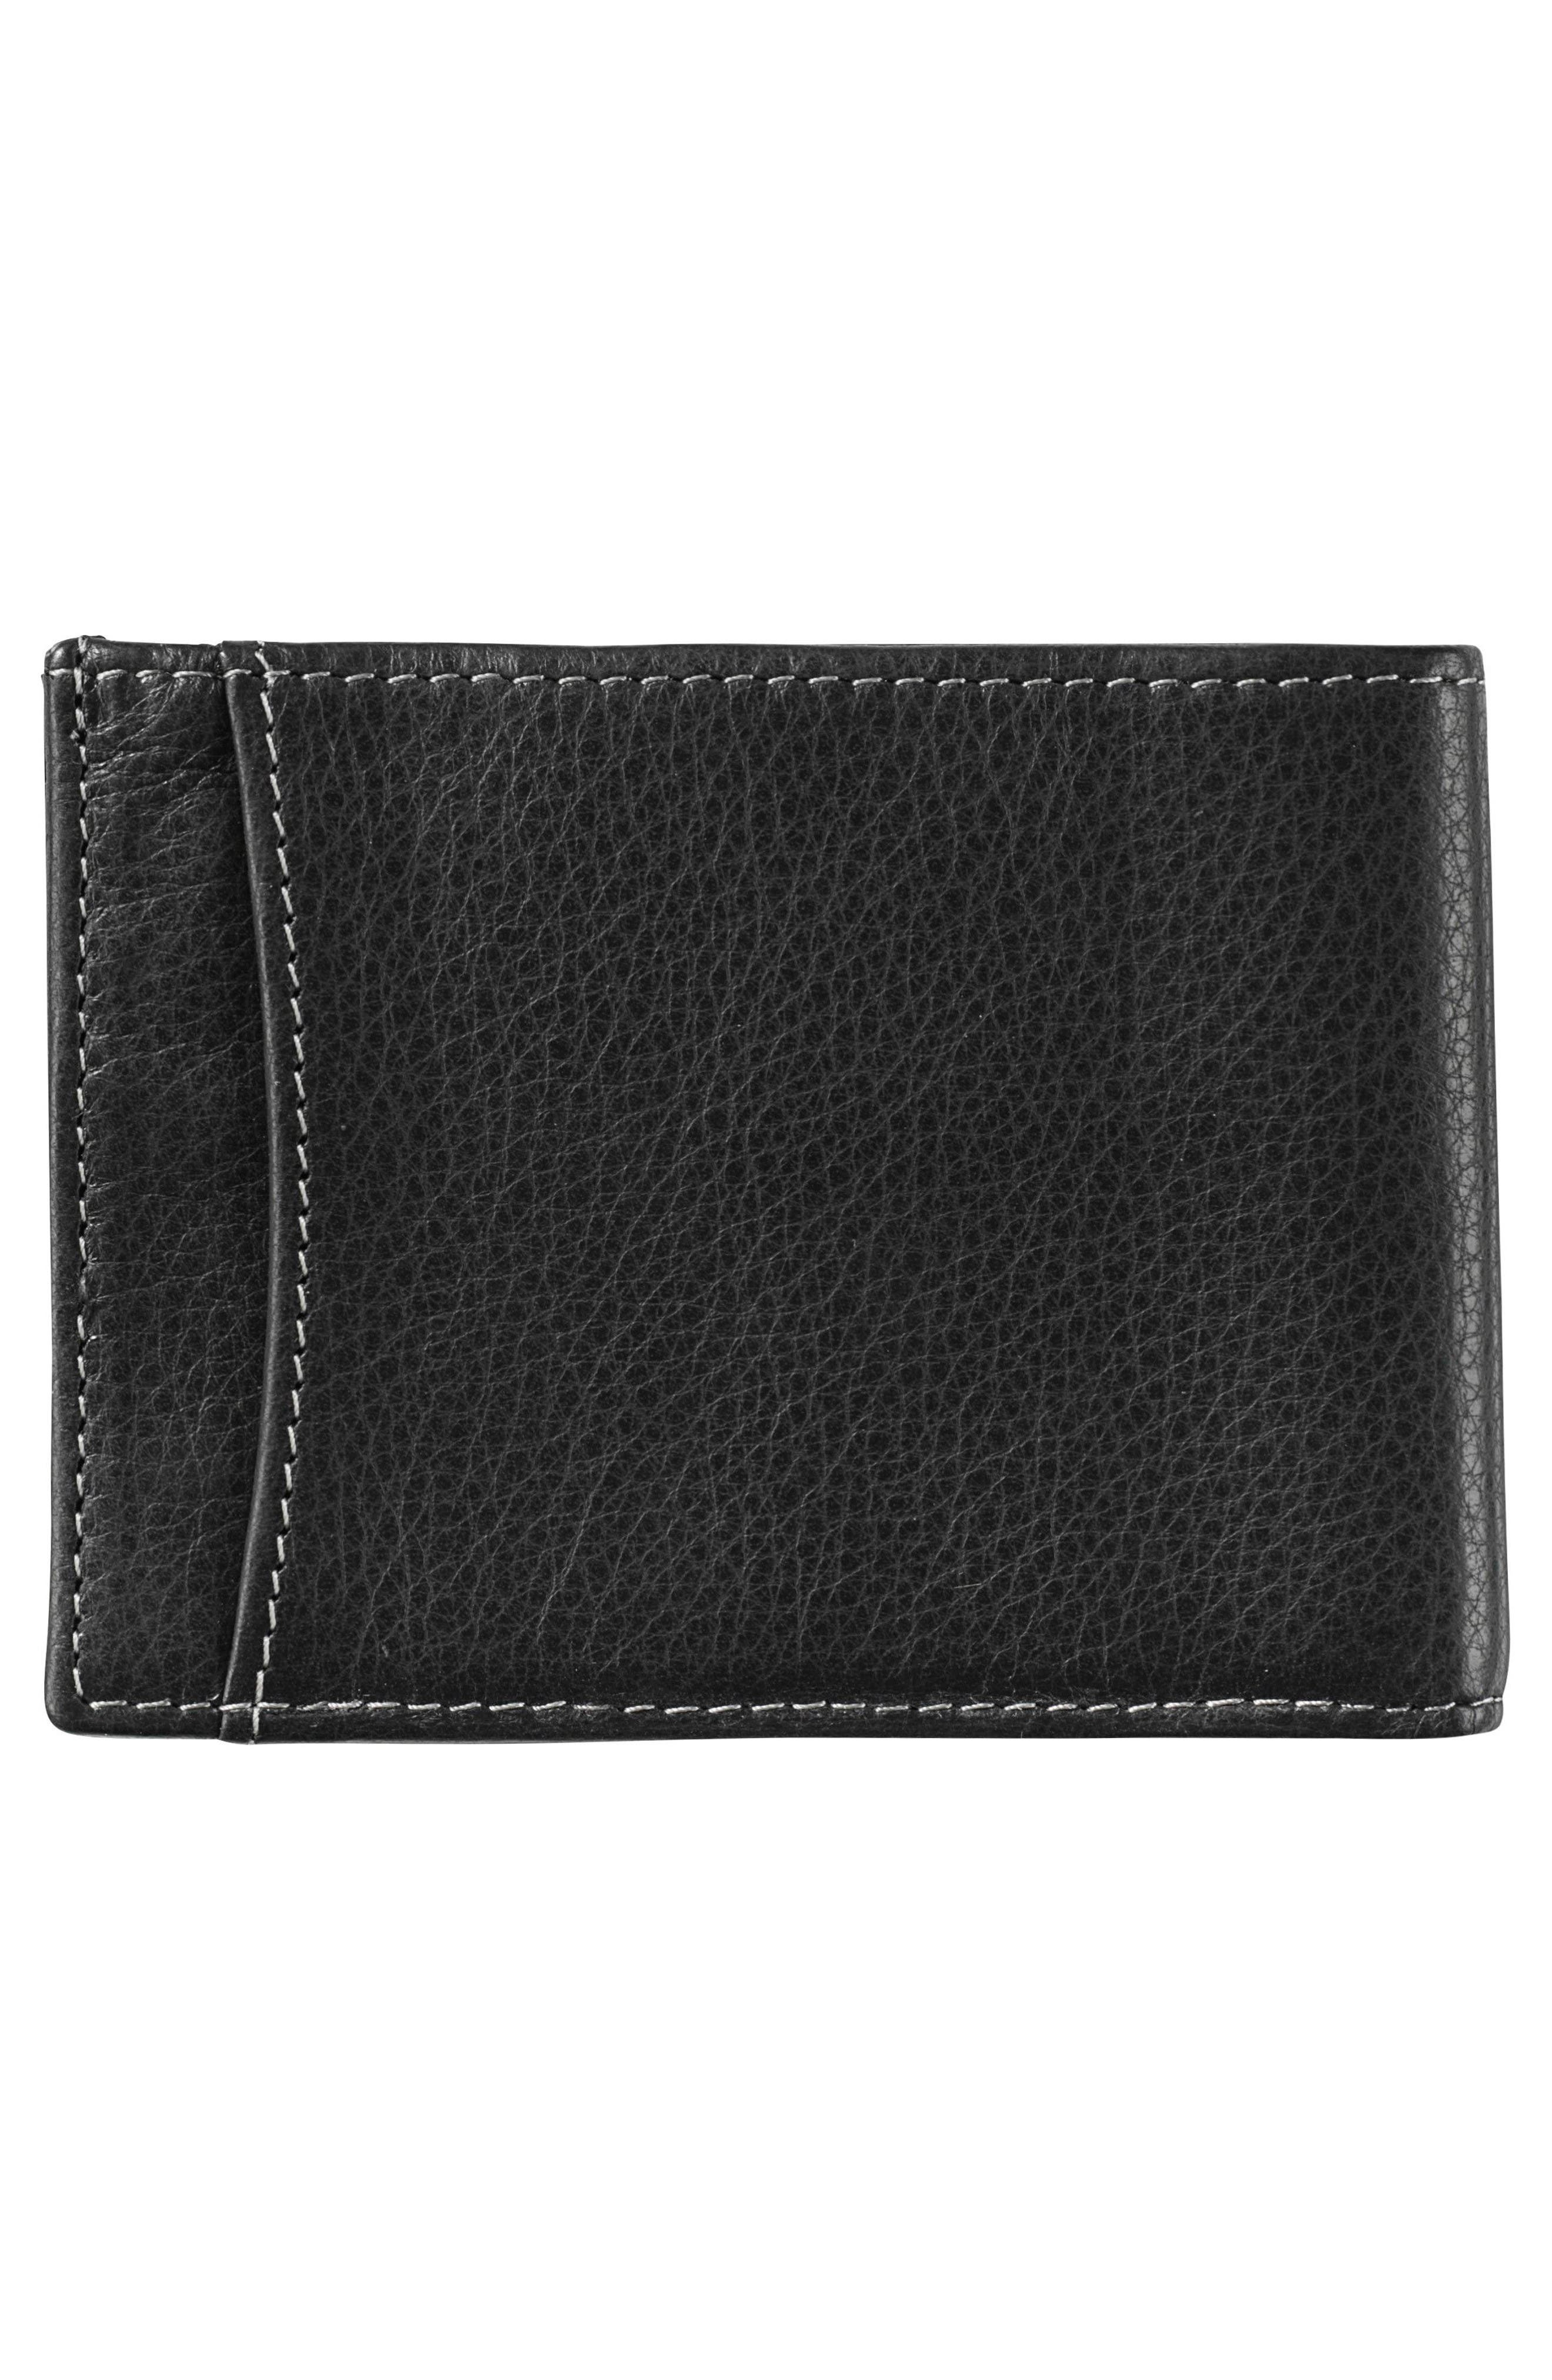 Leather Wallet,                             Alternate thumbnail 3, color,                             Black